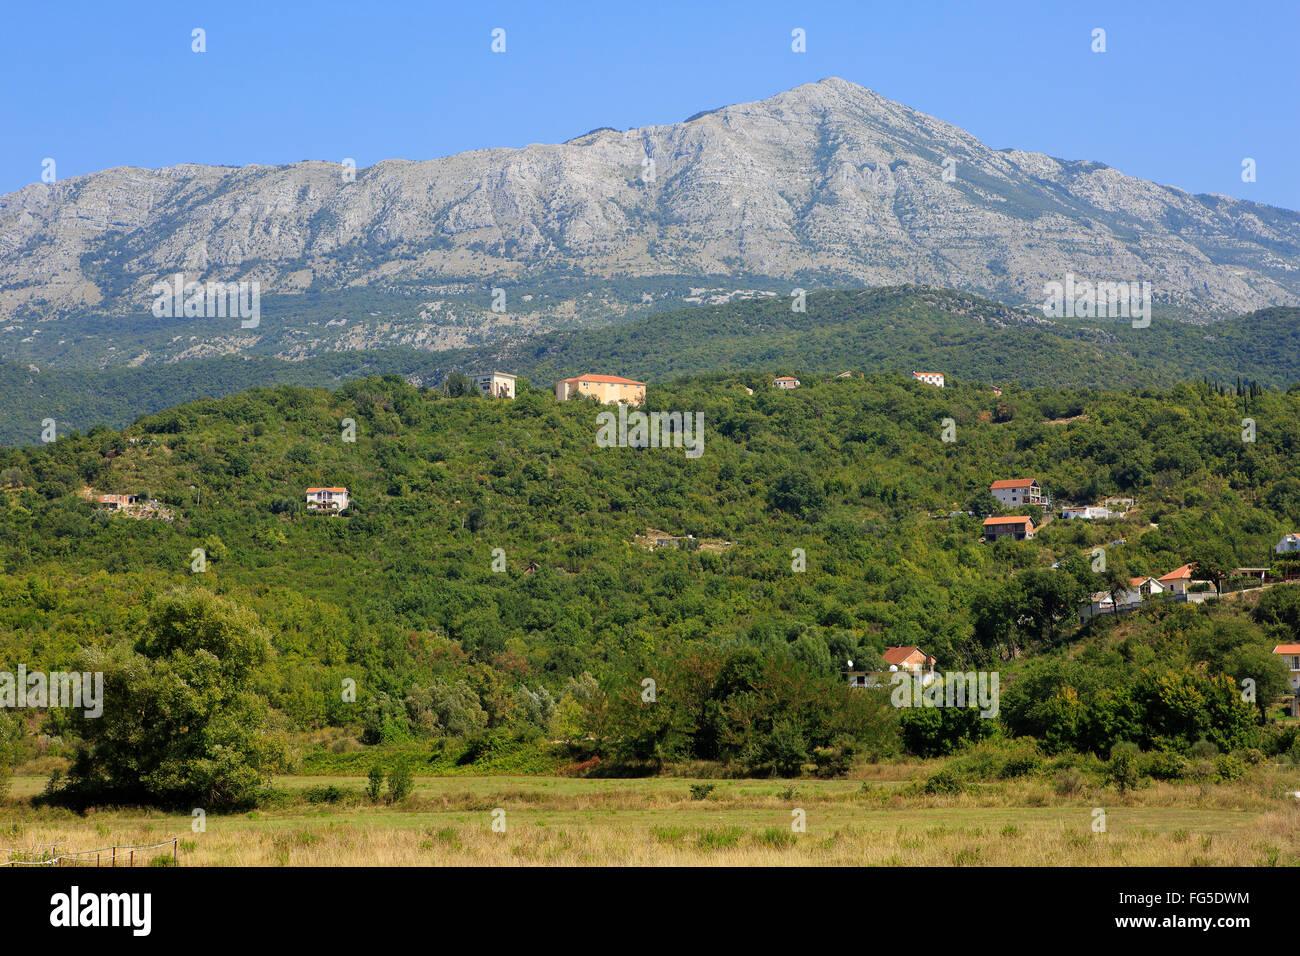 The Sutorina Valley along the Croatian-Montenegrin border in Montenegro, Europe Stock Photo